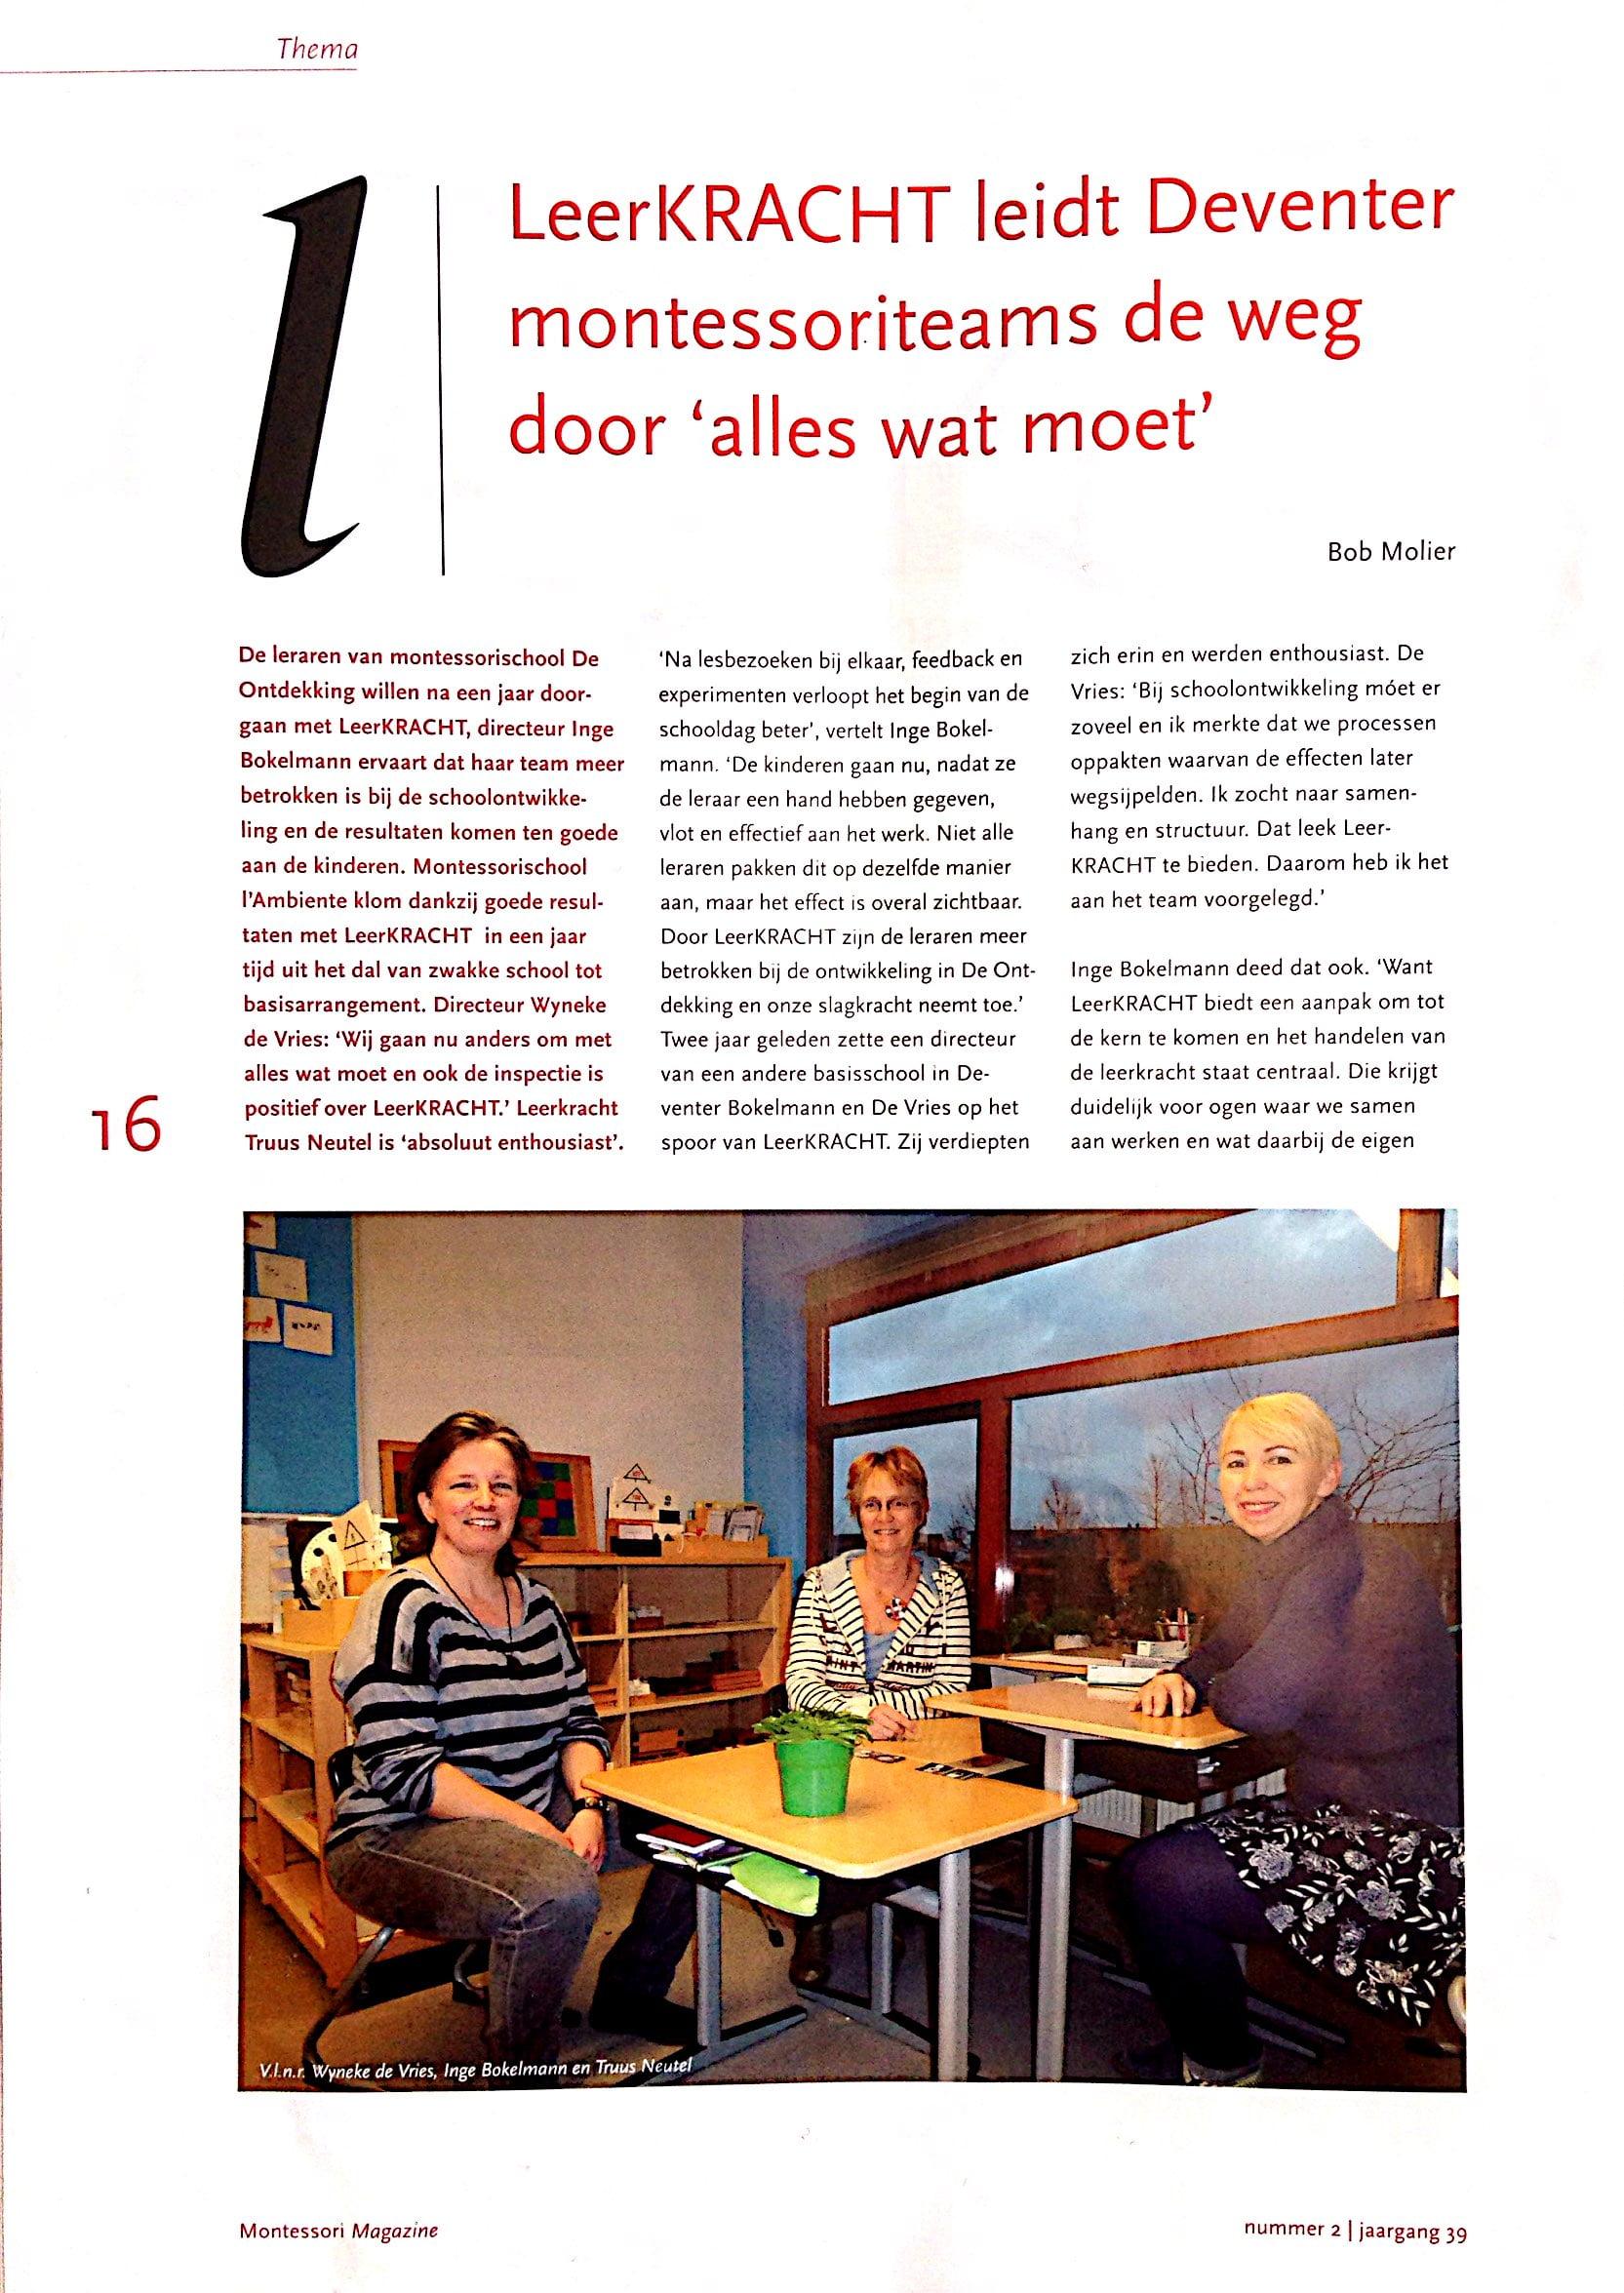 LeerKRACHT in Montessori Magazine